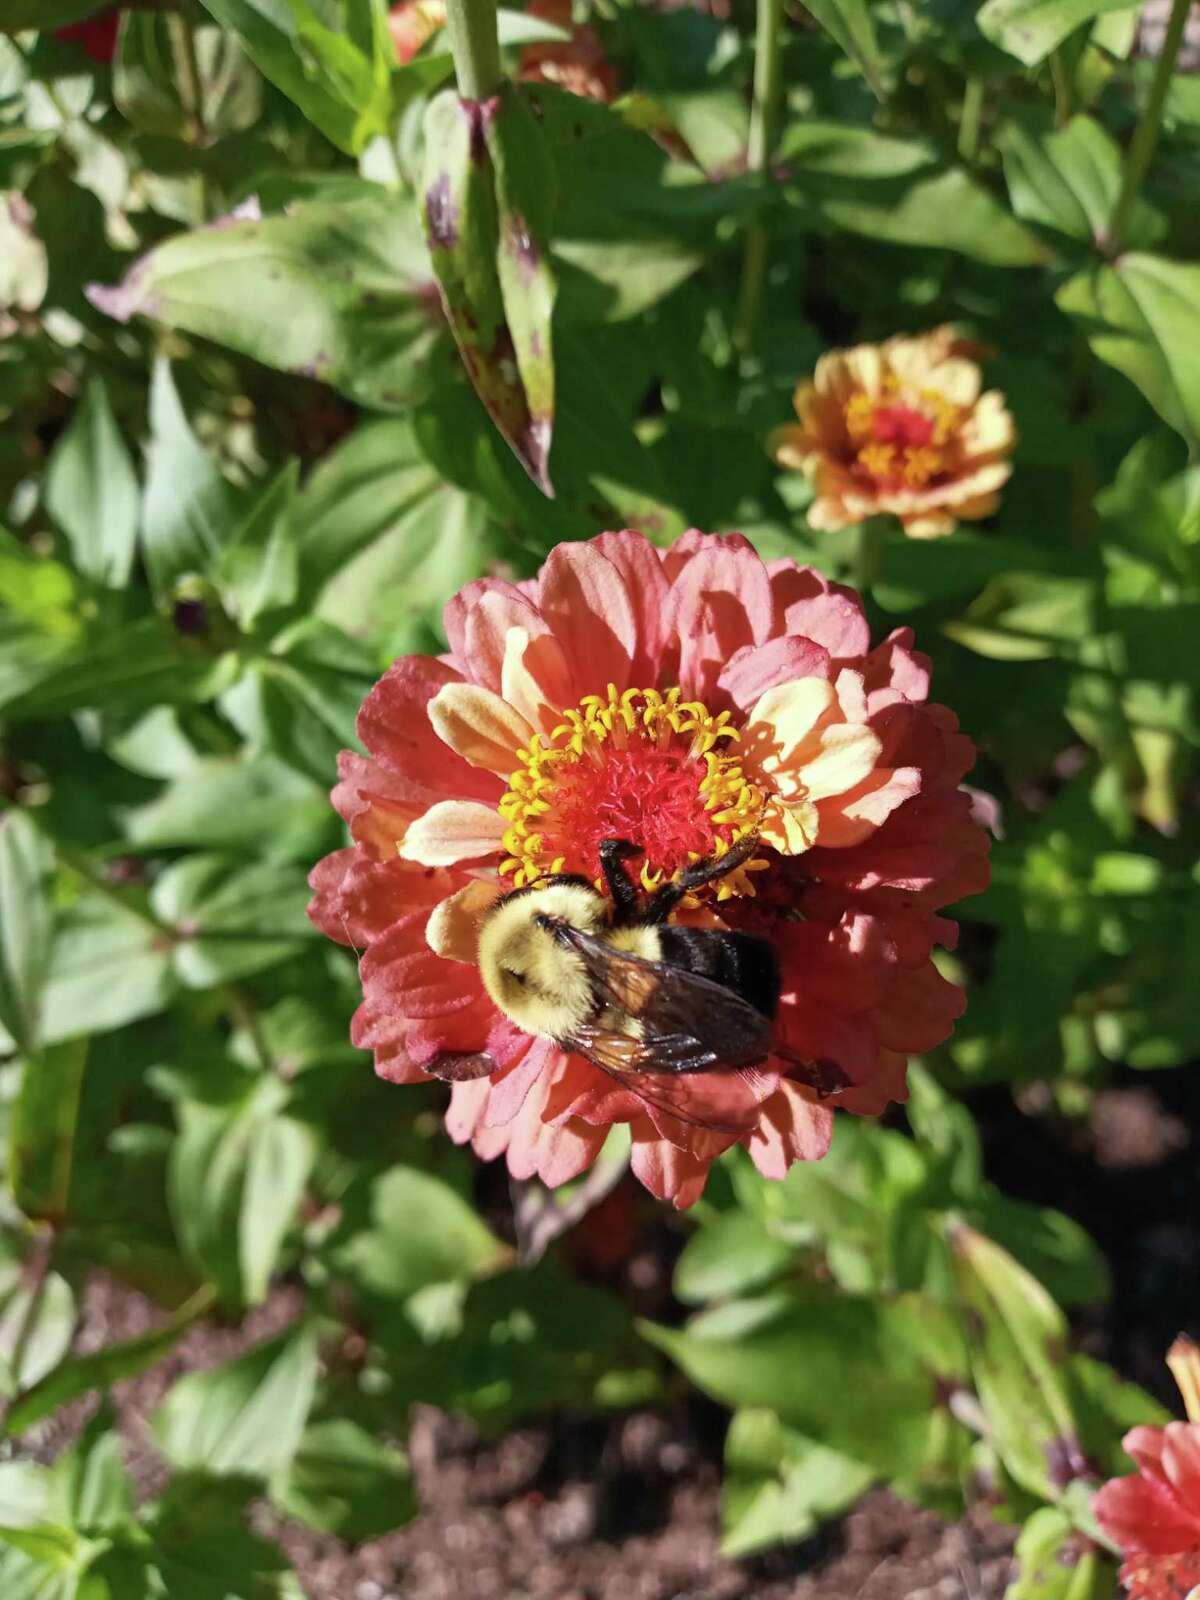 Close-up in garden.